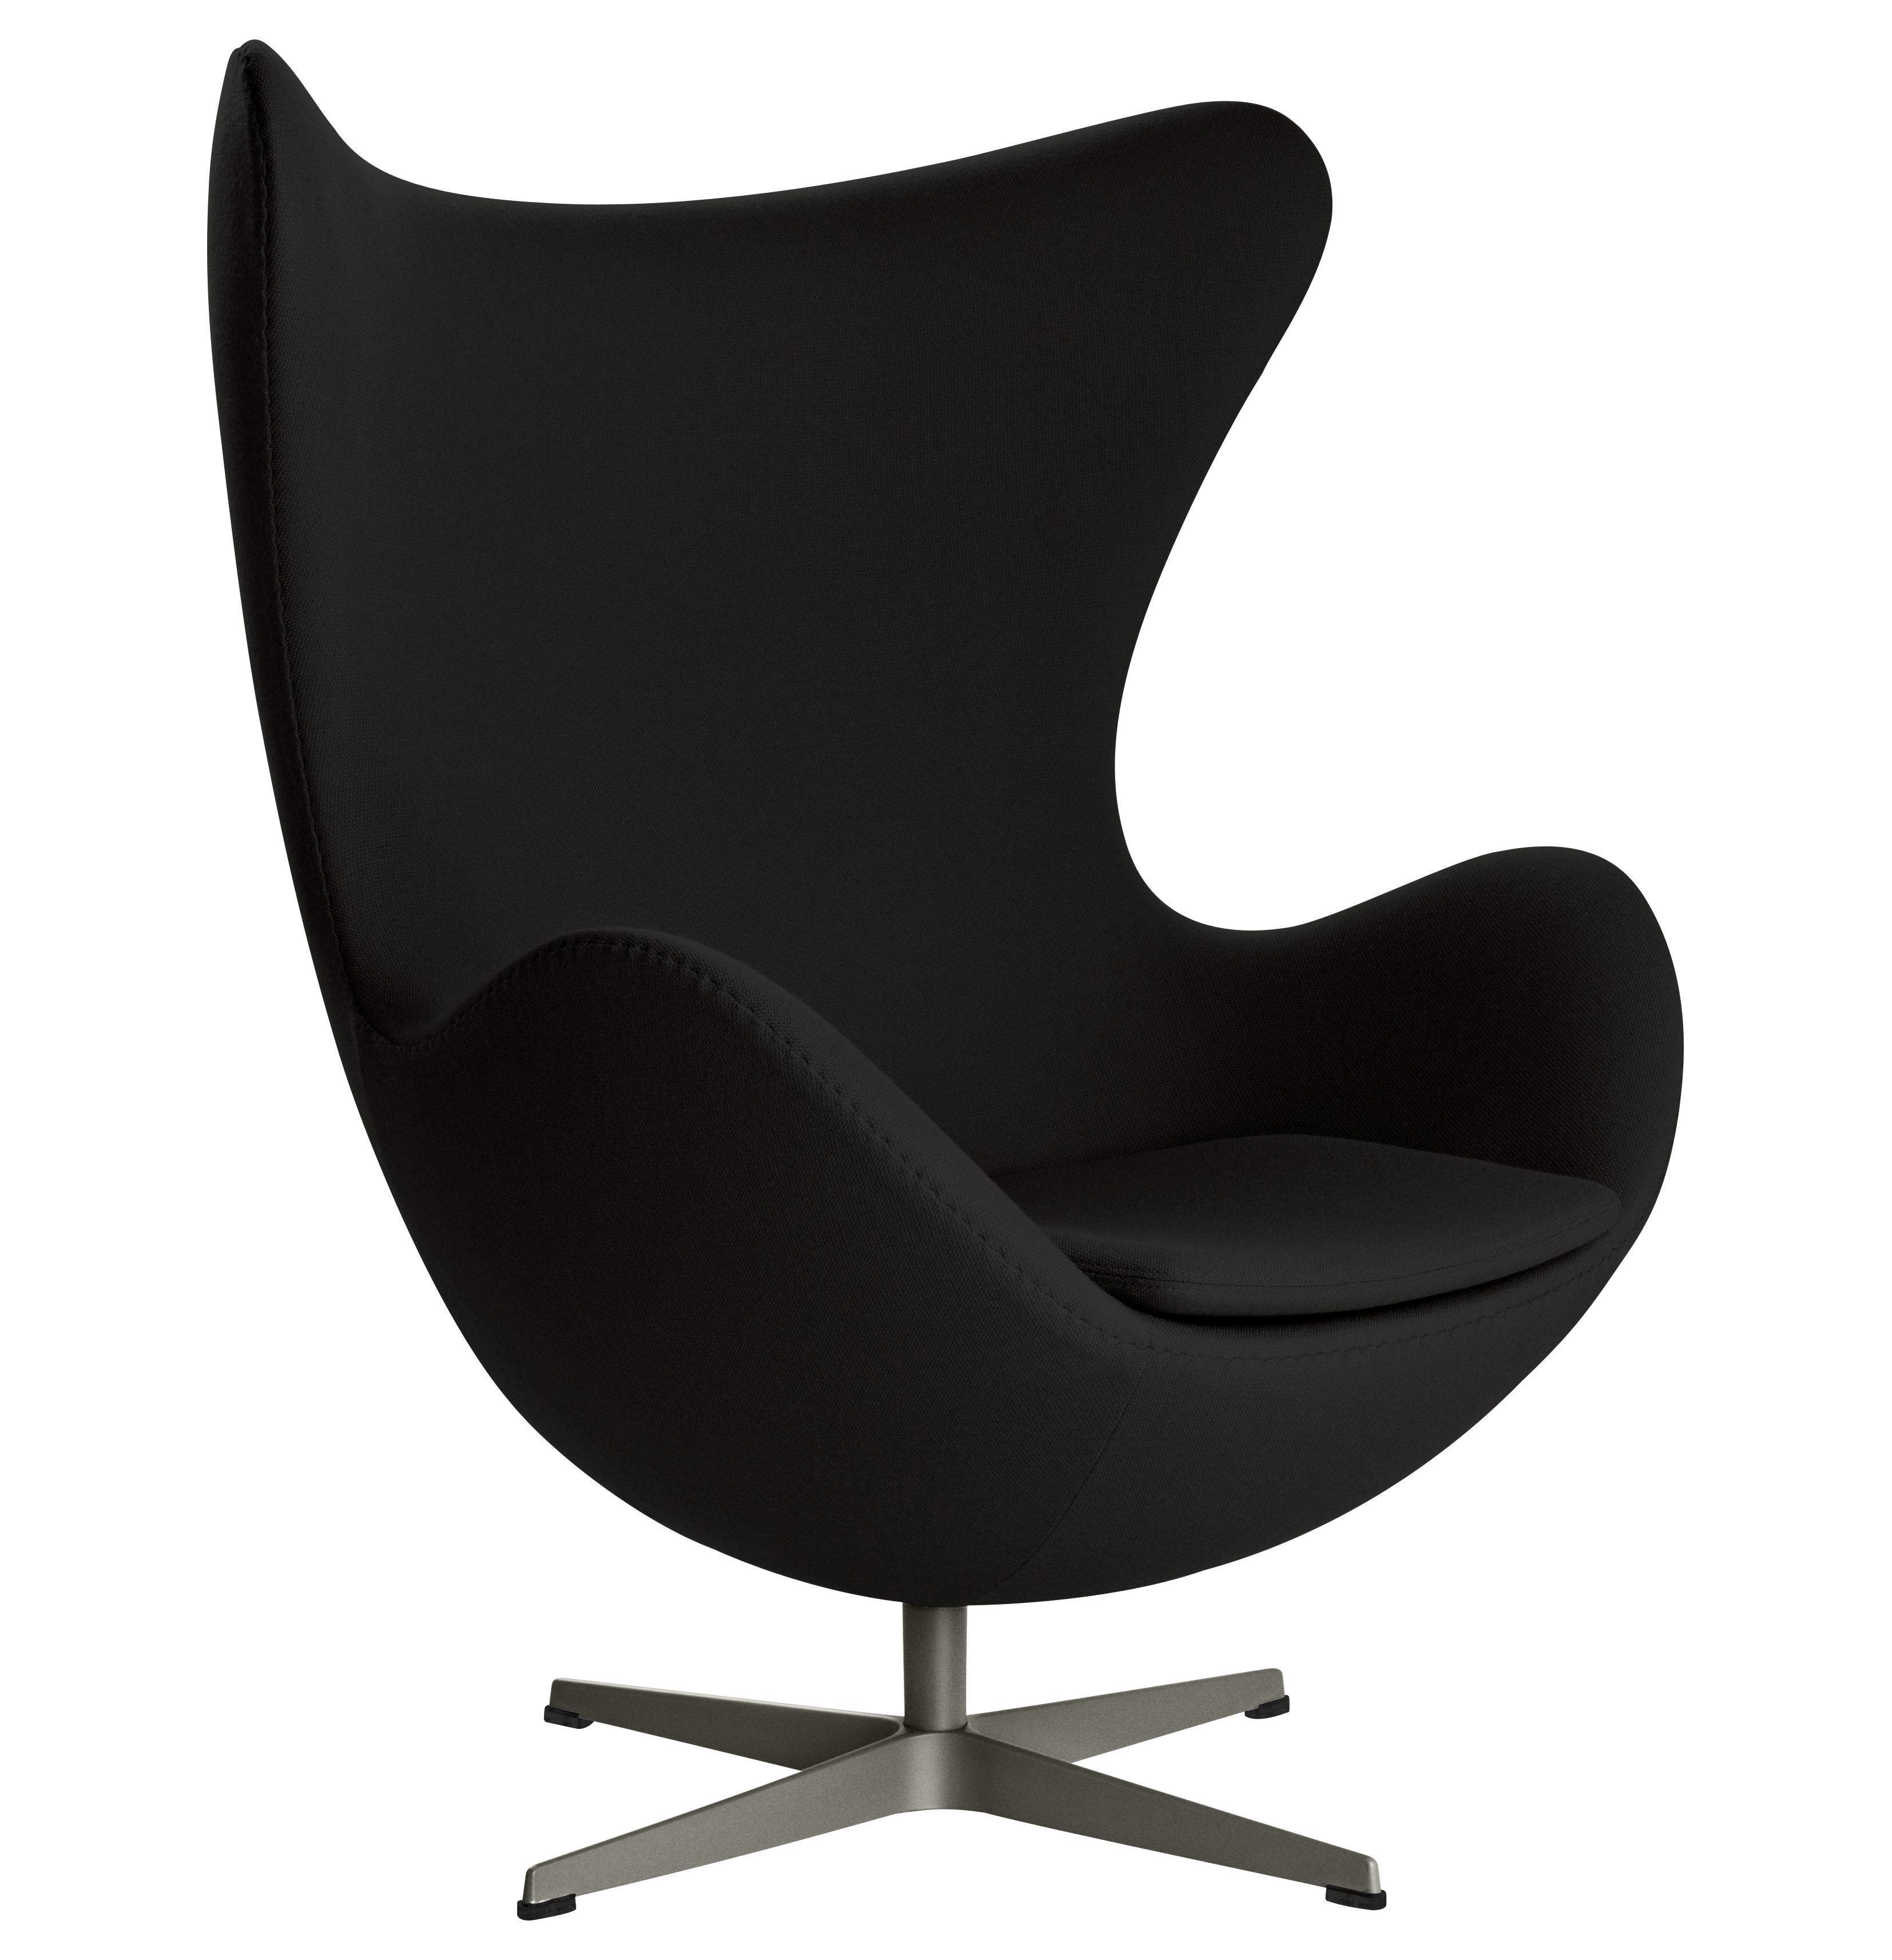 Furniture - Armchairs - Egg chair Swivel armchair - Gabriele fabric by Fritz Hansen - Black - Fabric, Fibreglass, Polished aluminium, Polyurethane foam